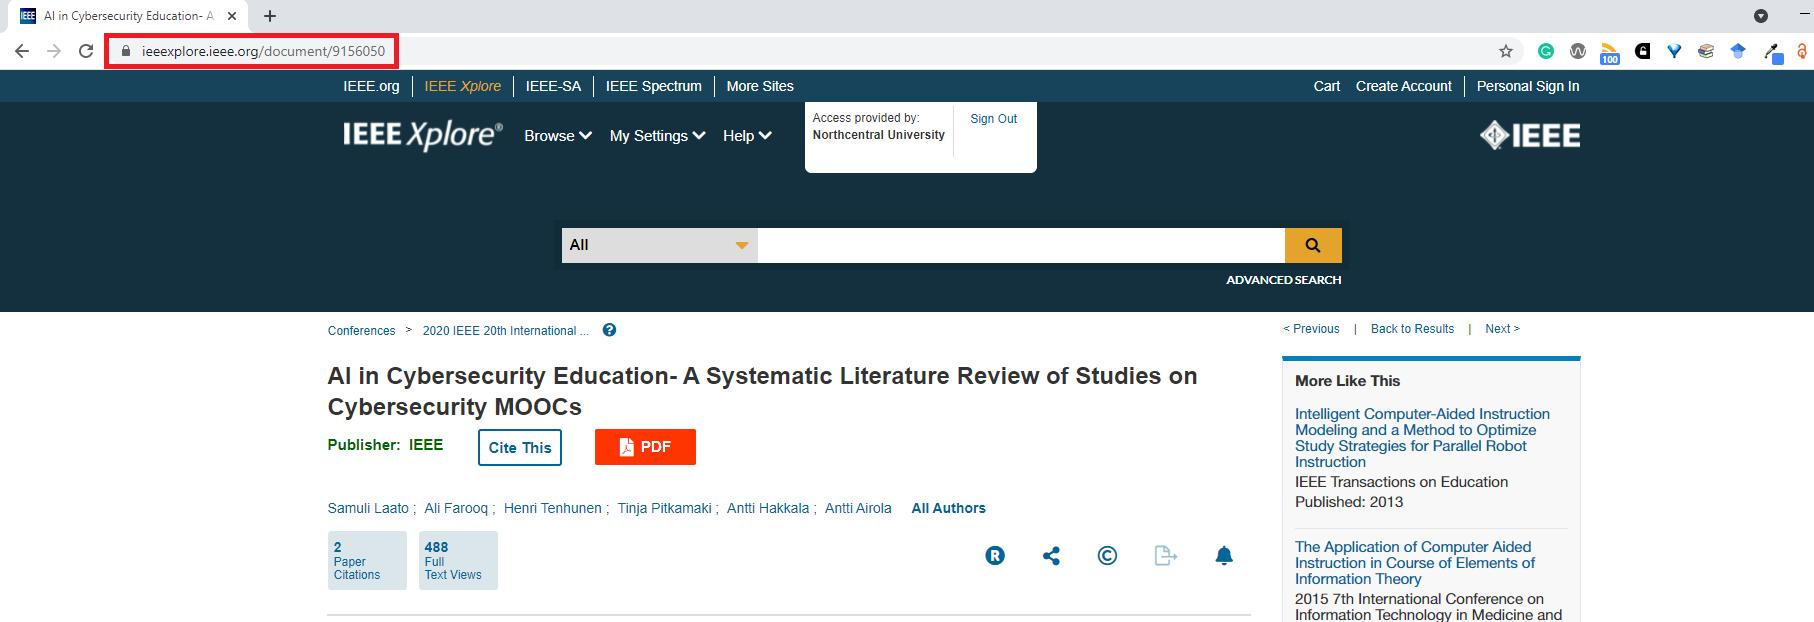 IEEE Xplore Digital Library access URL in browser bar